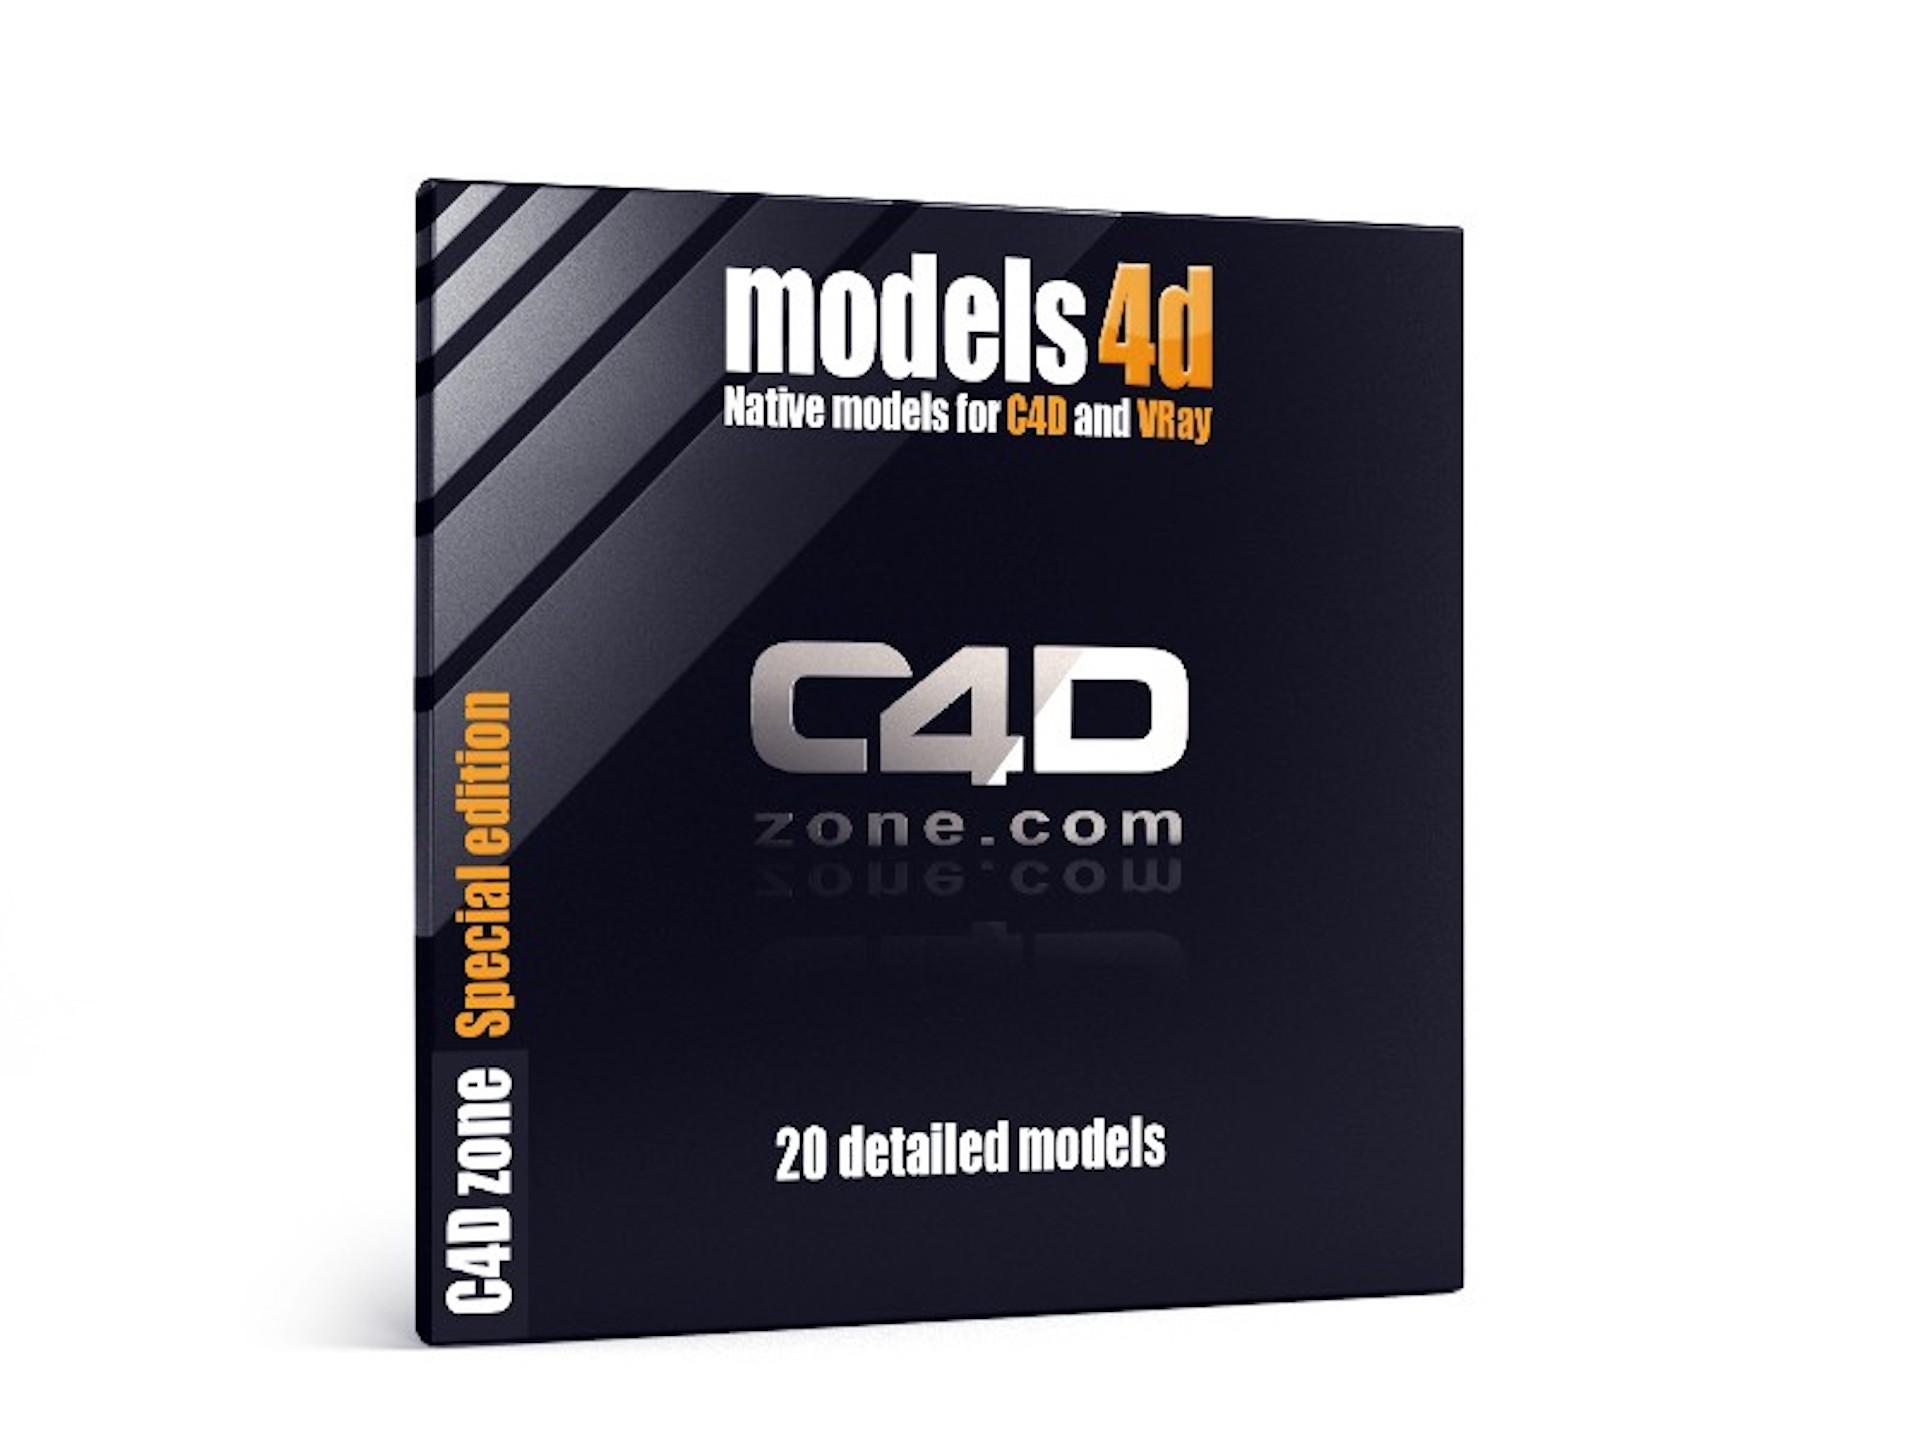 Models 4D Free Pack - Models - Download - C4Dzone